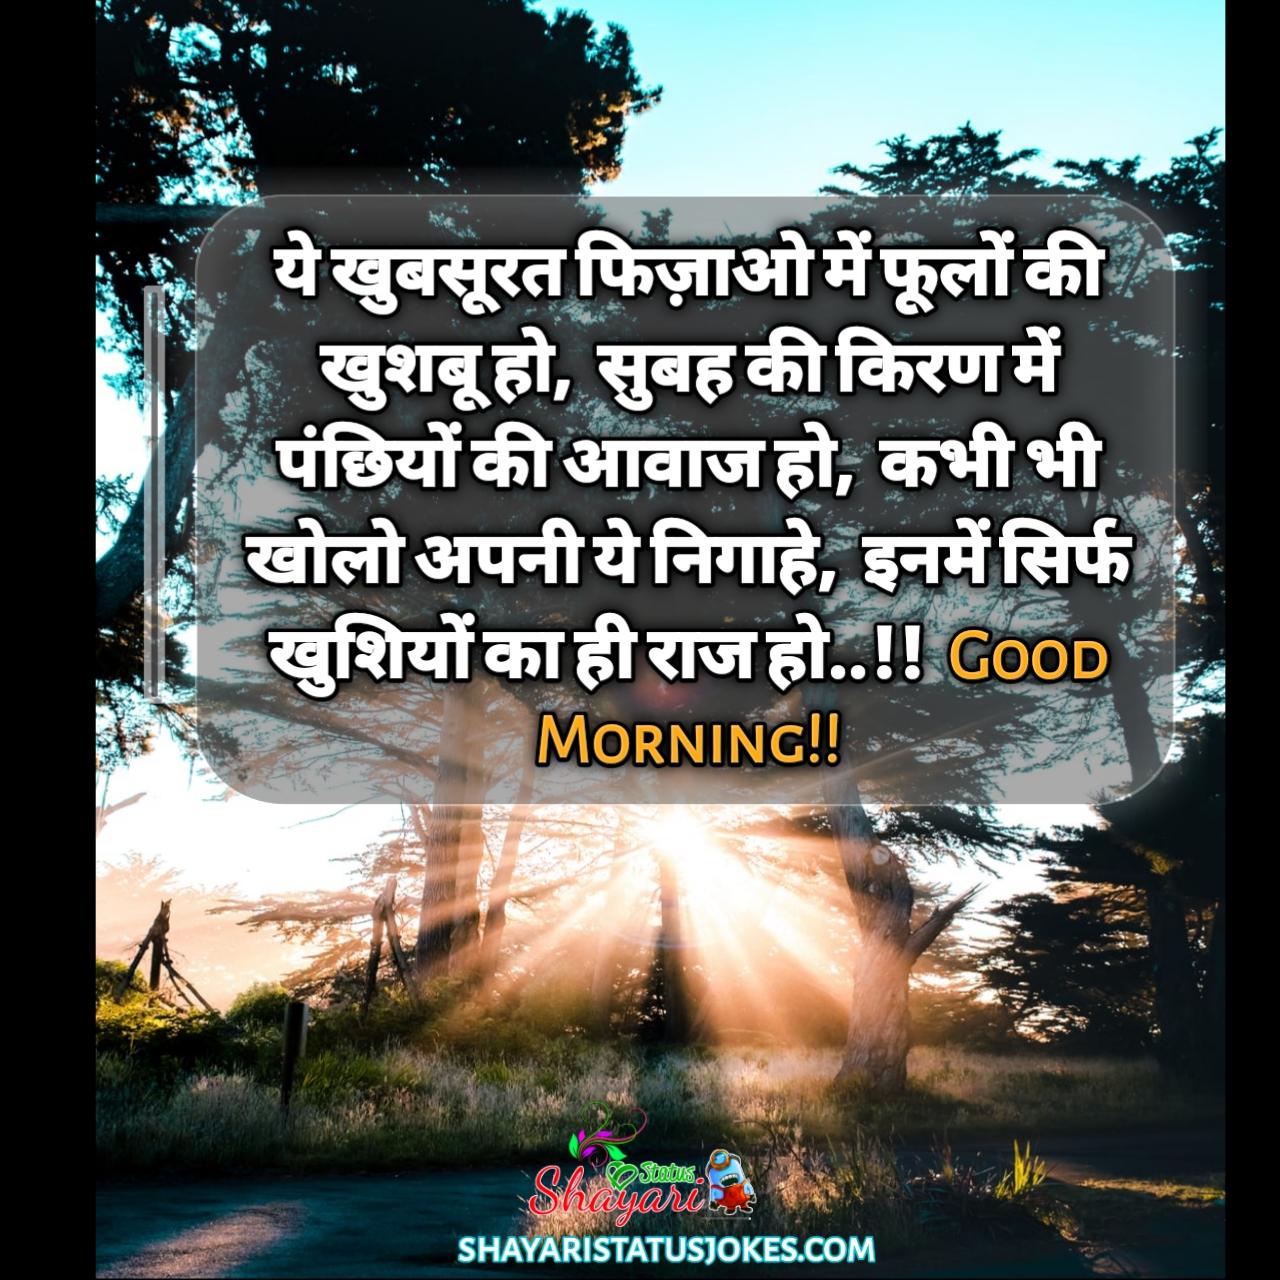 Good Morning Quotes good-morning-quotes-in-hindi,good-morning-gif,GoodMorning-Wishes,Shubh-Prabhat,शुभ-प्रभात,good-morning-love,शुभ-प्रभात-सुविचार,